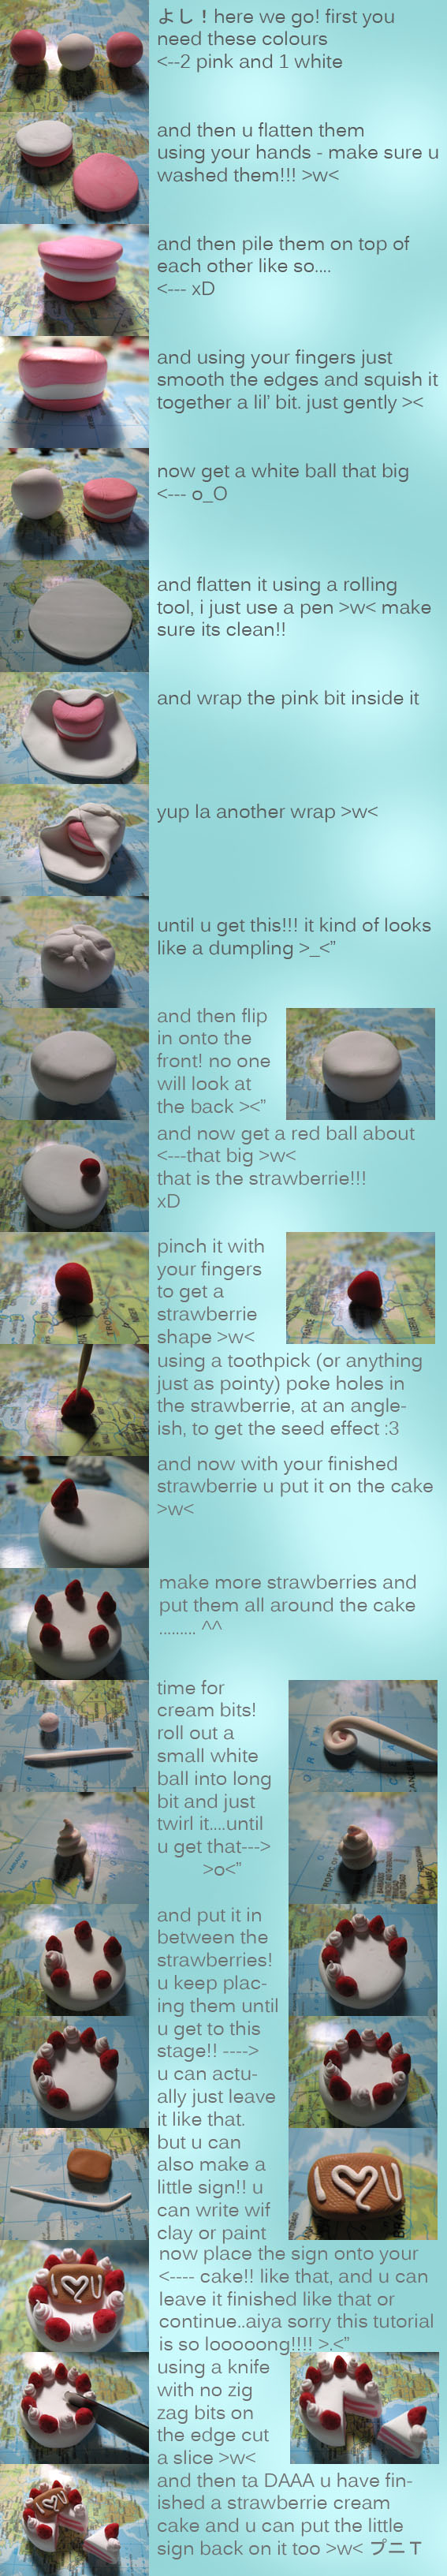 Strawberry Cake charm Tutorial by PuniTotoro